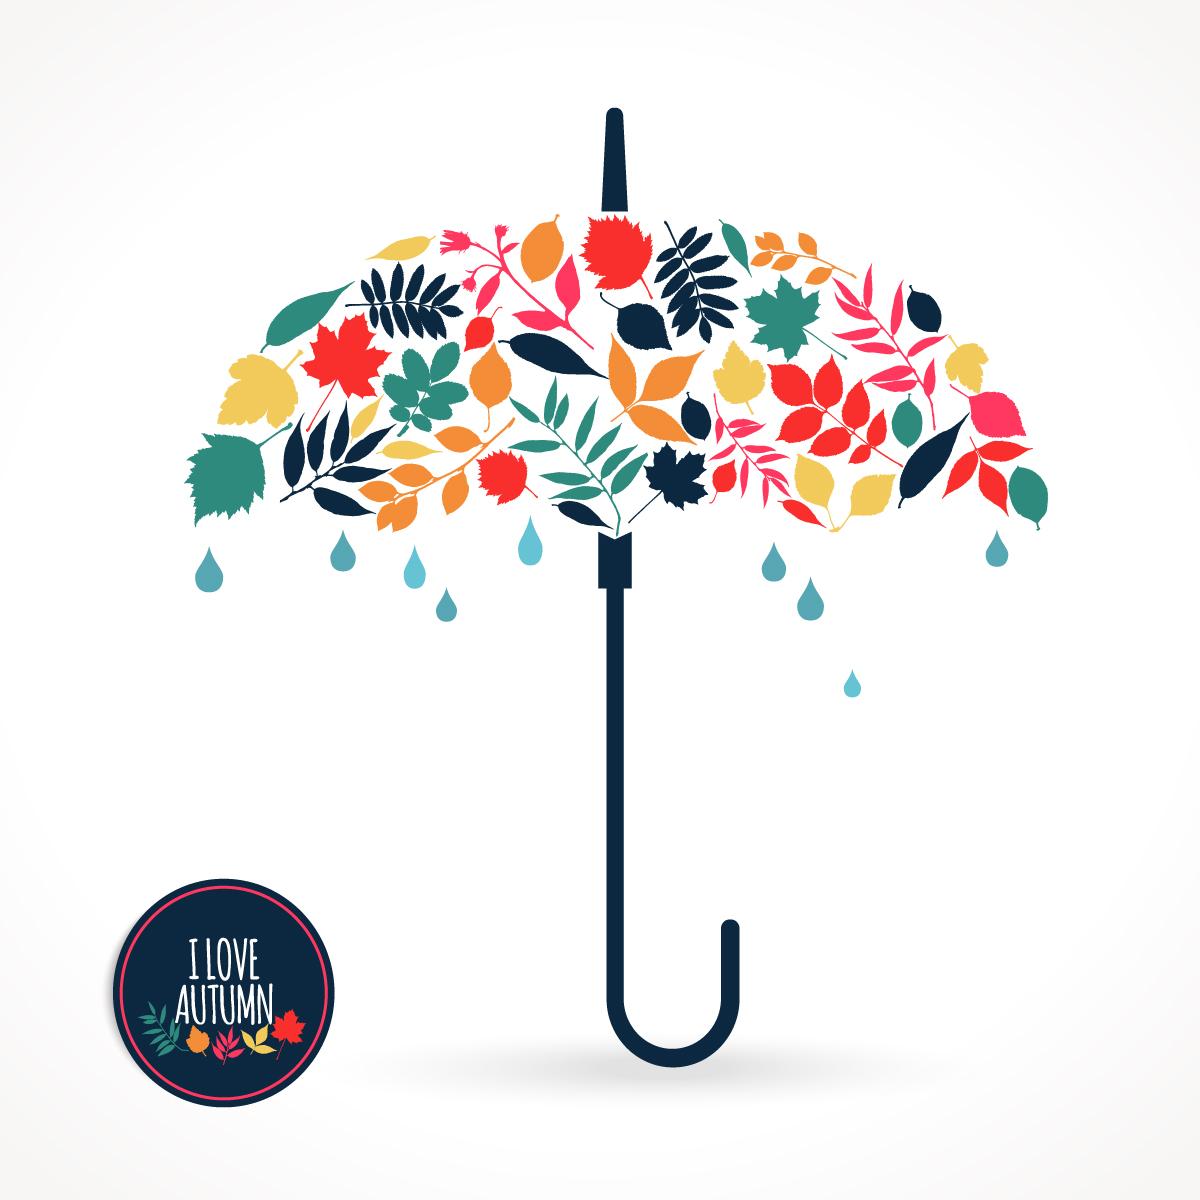 Vector Illustration Umbrella Free Download Vector CDR, AI, EPS and PNG Formats